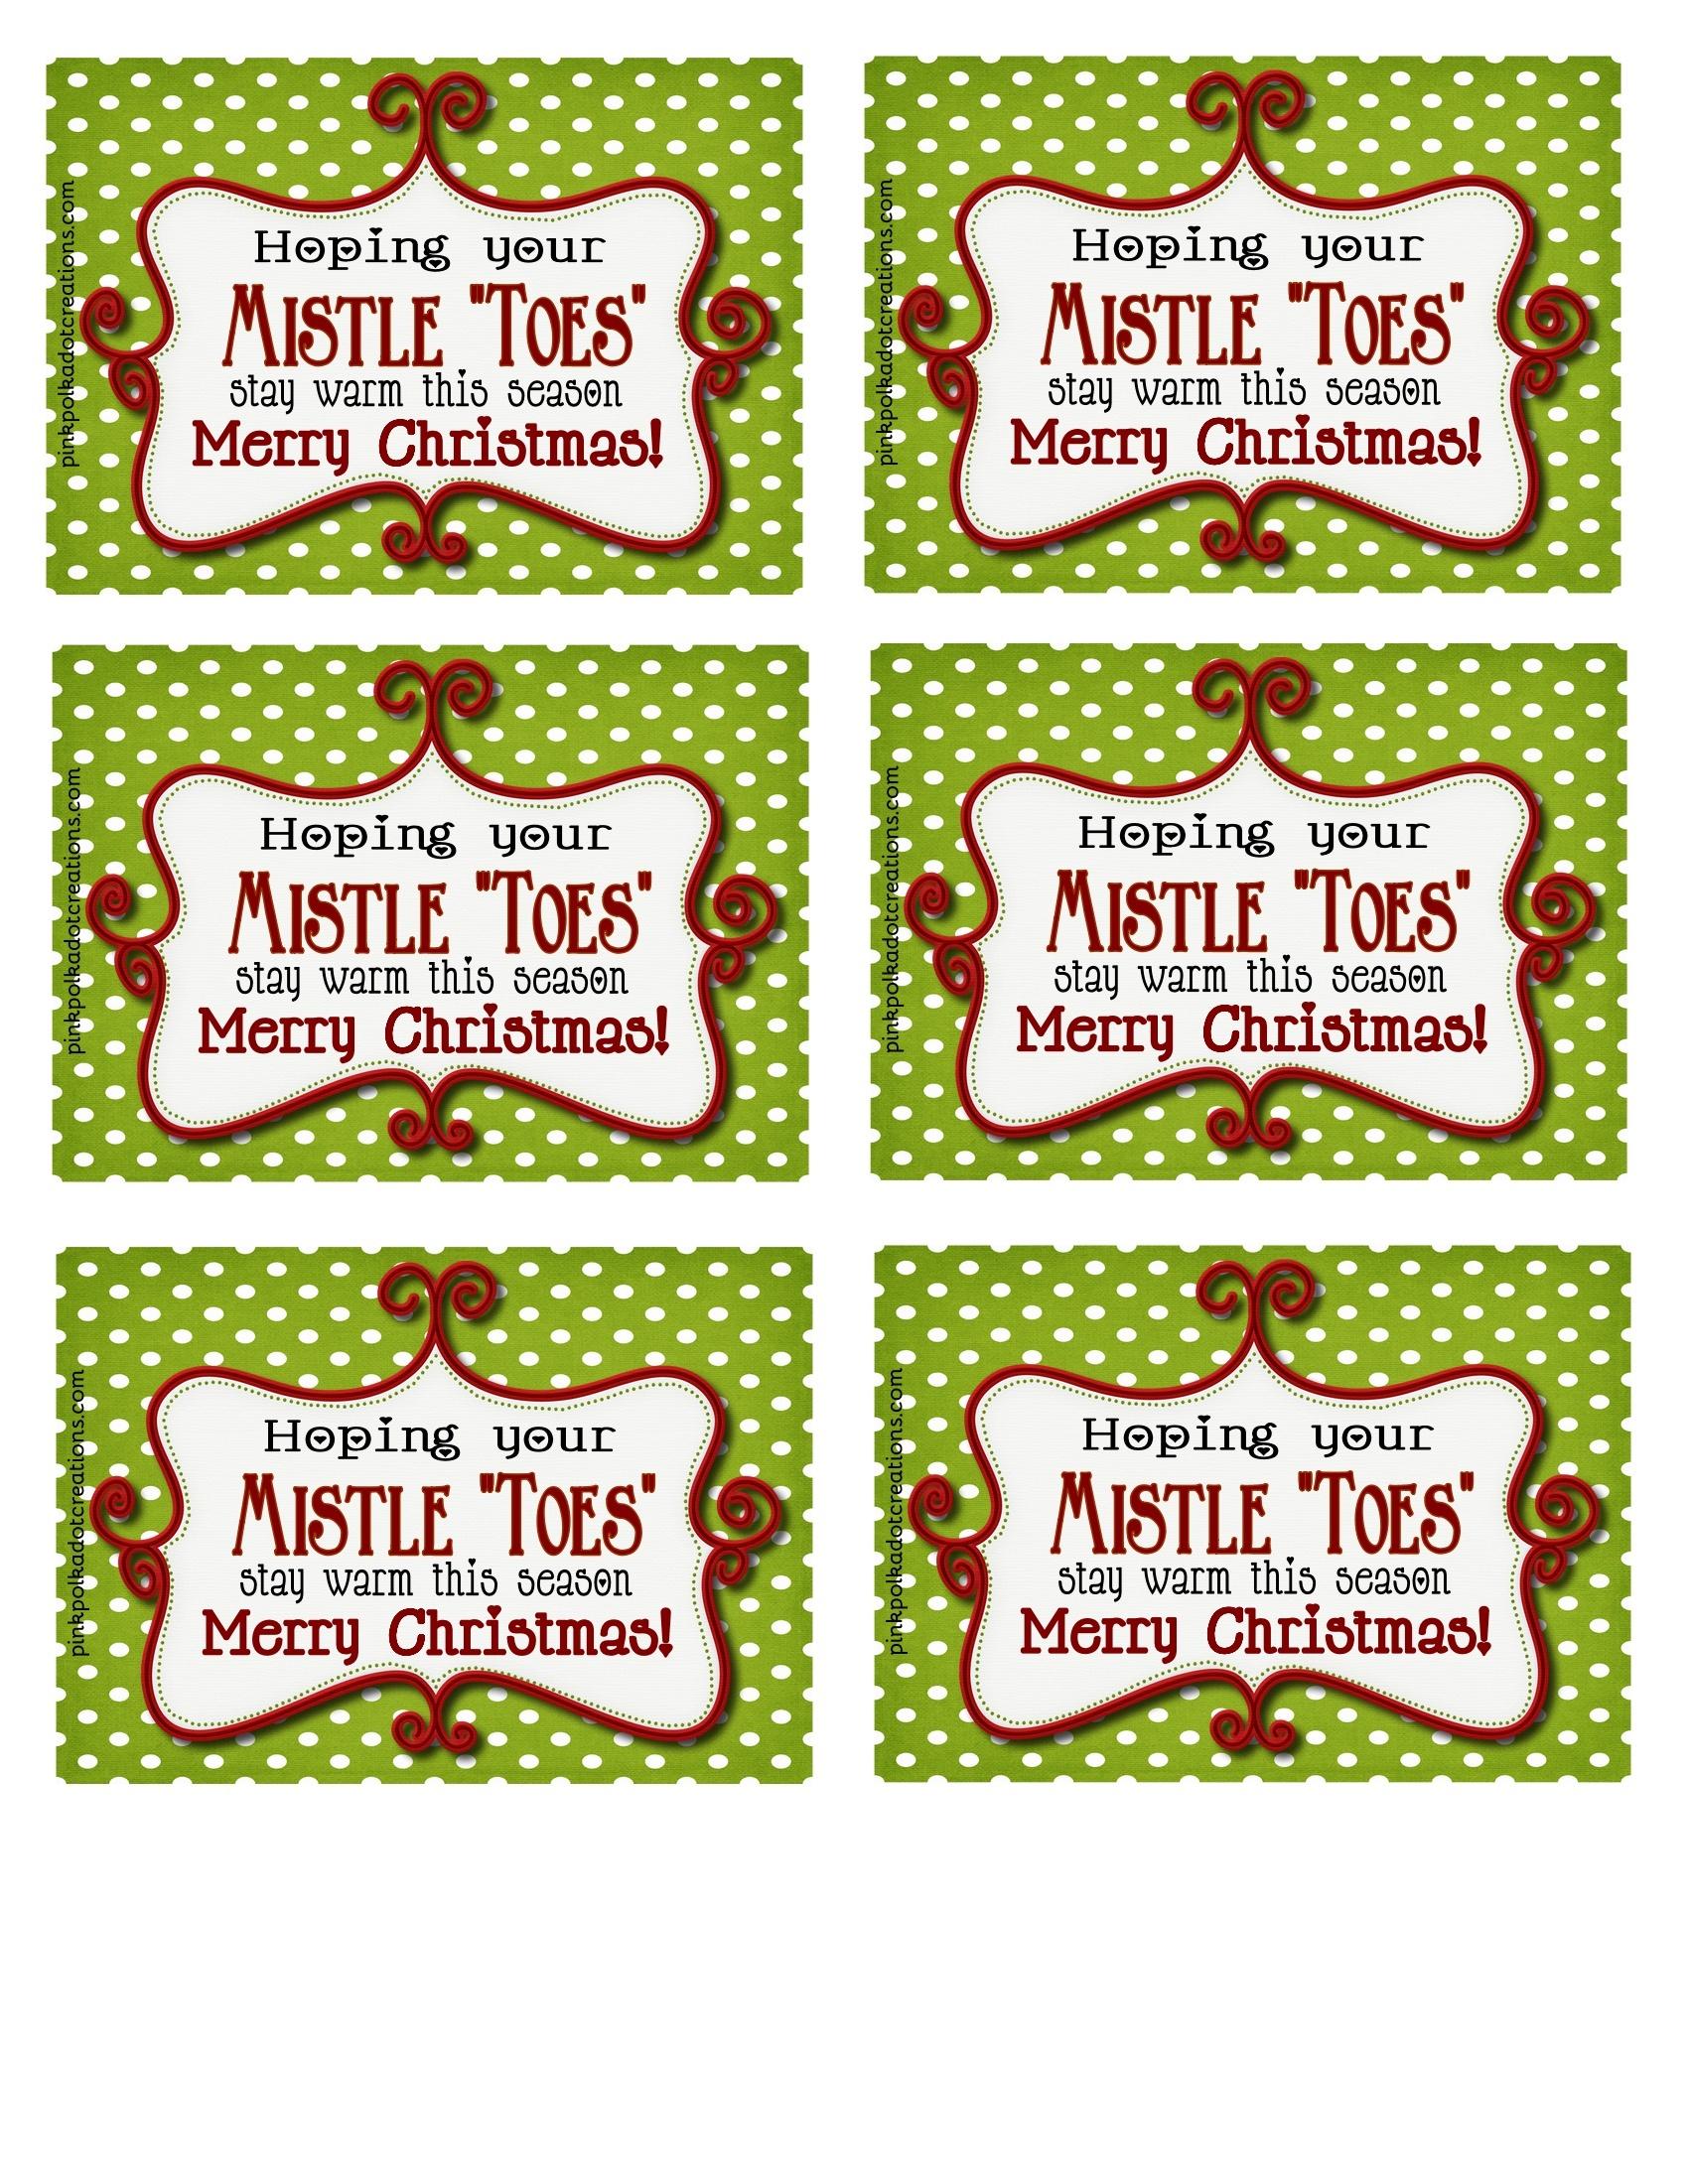 "Mistle""toes"" Gift Idea - Pink Polka Dot Creations - Free Printable Mistletoe Tags"